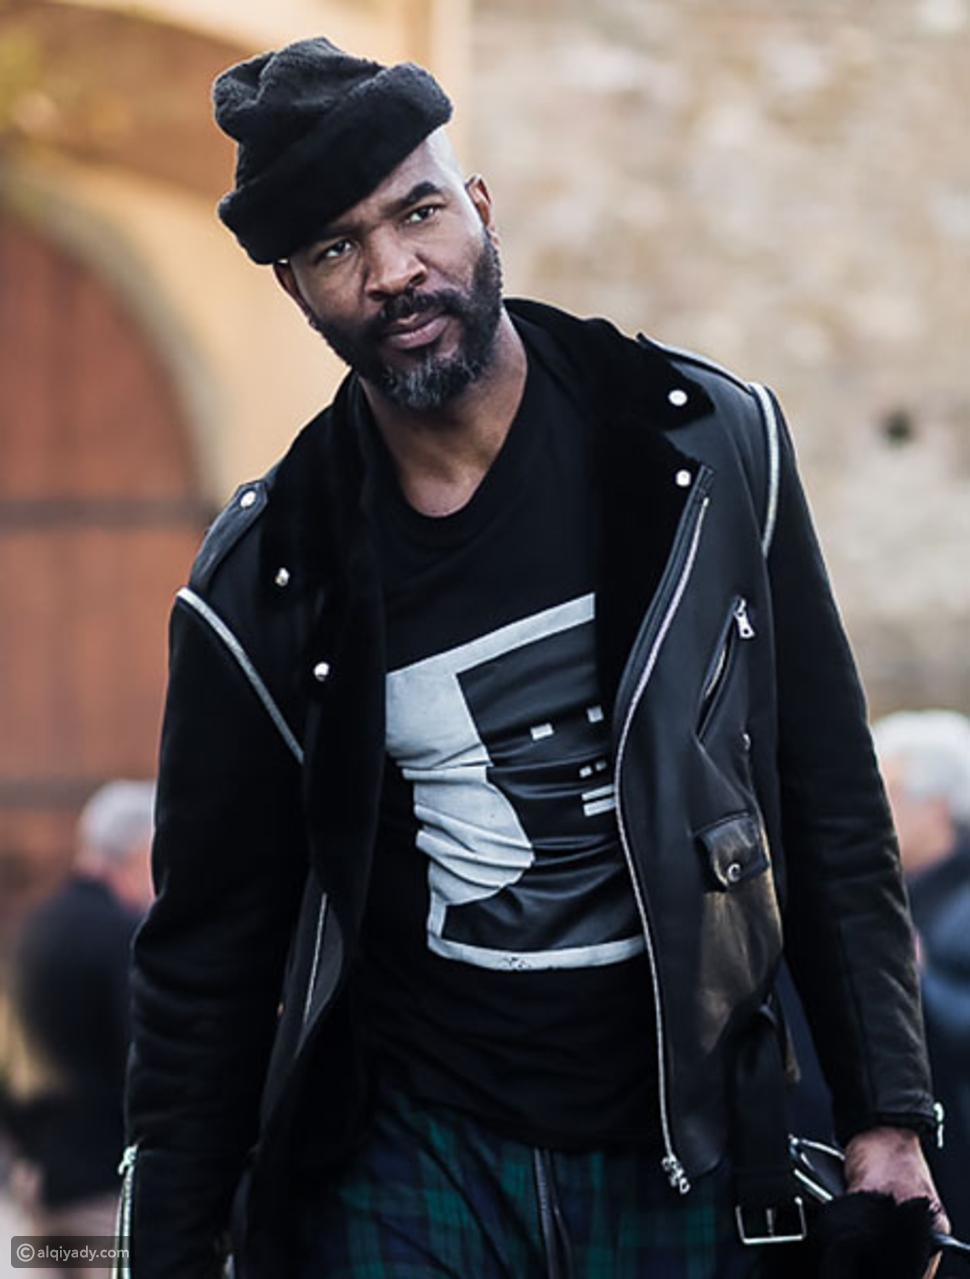 Classic Beard: